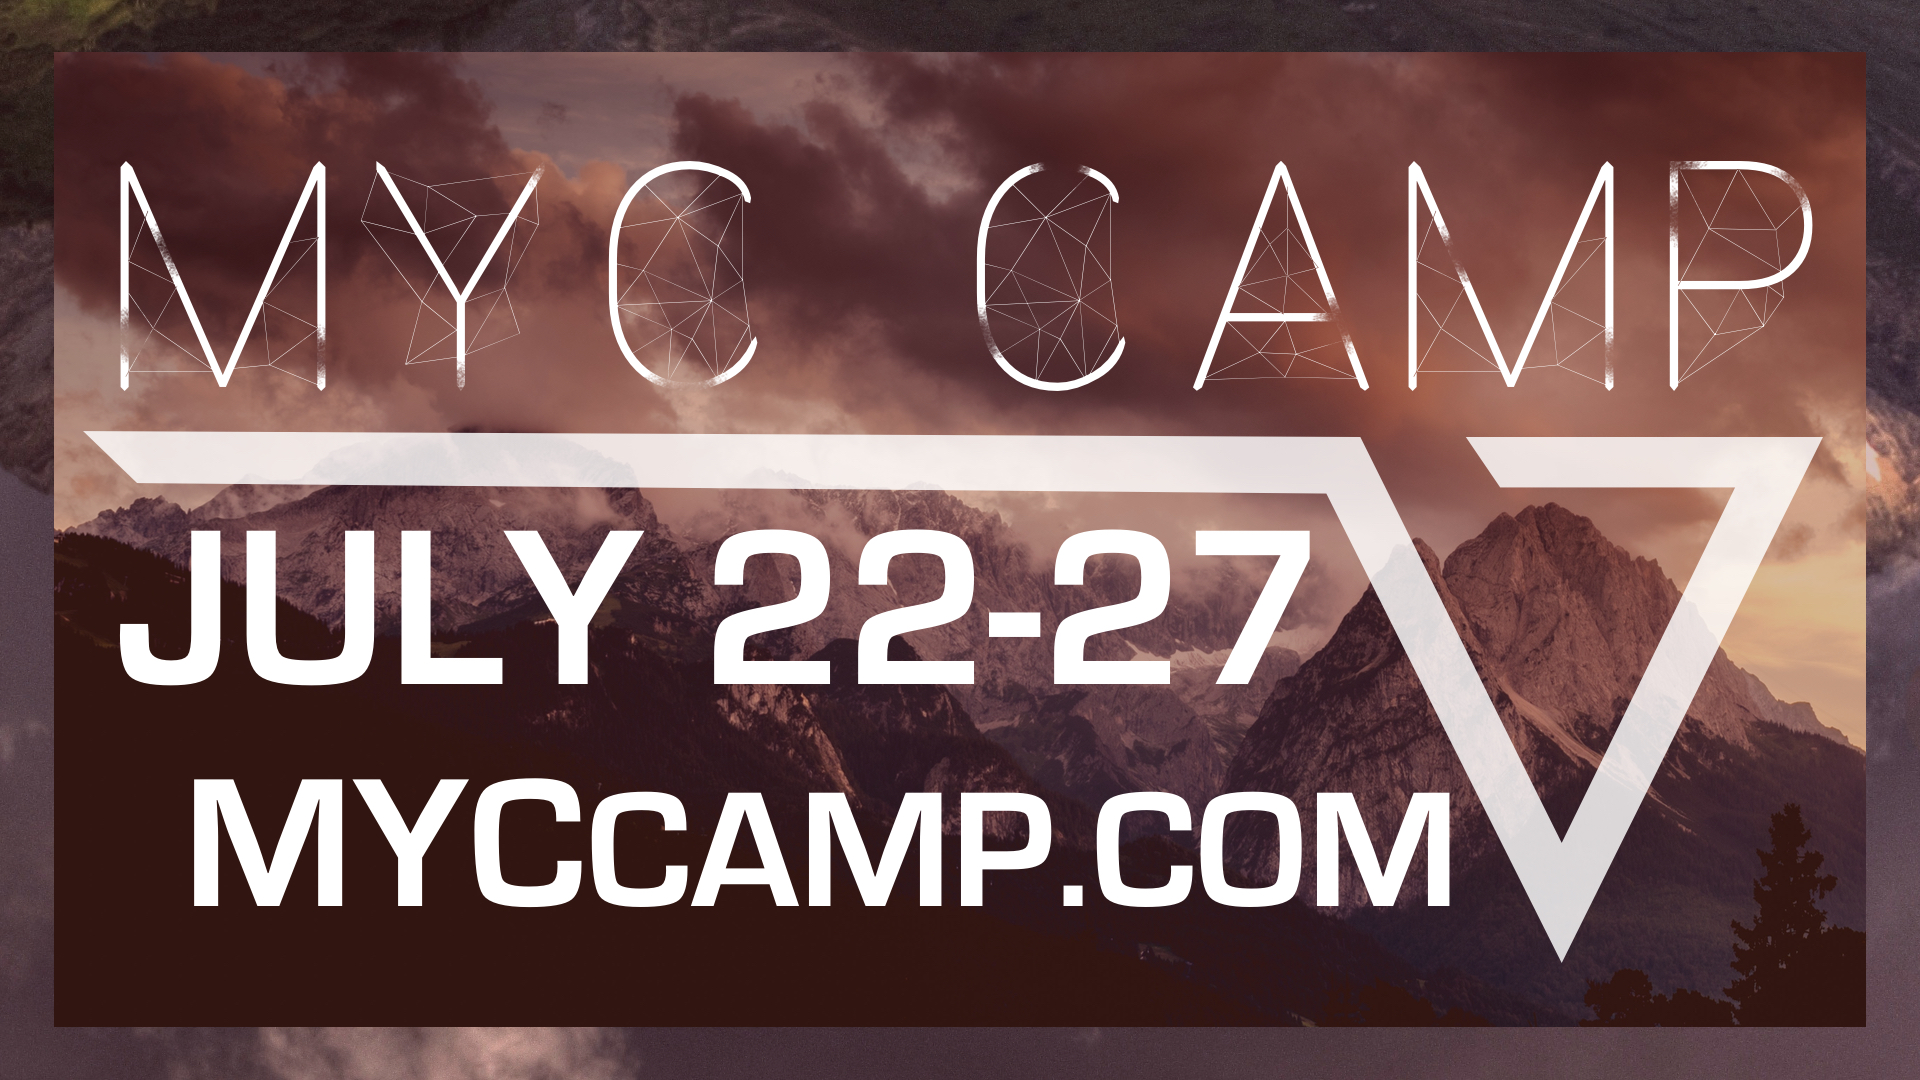 Myc camp